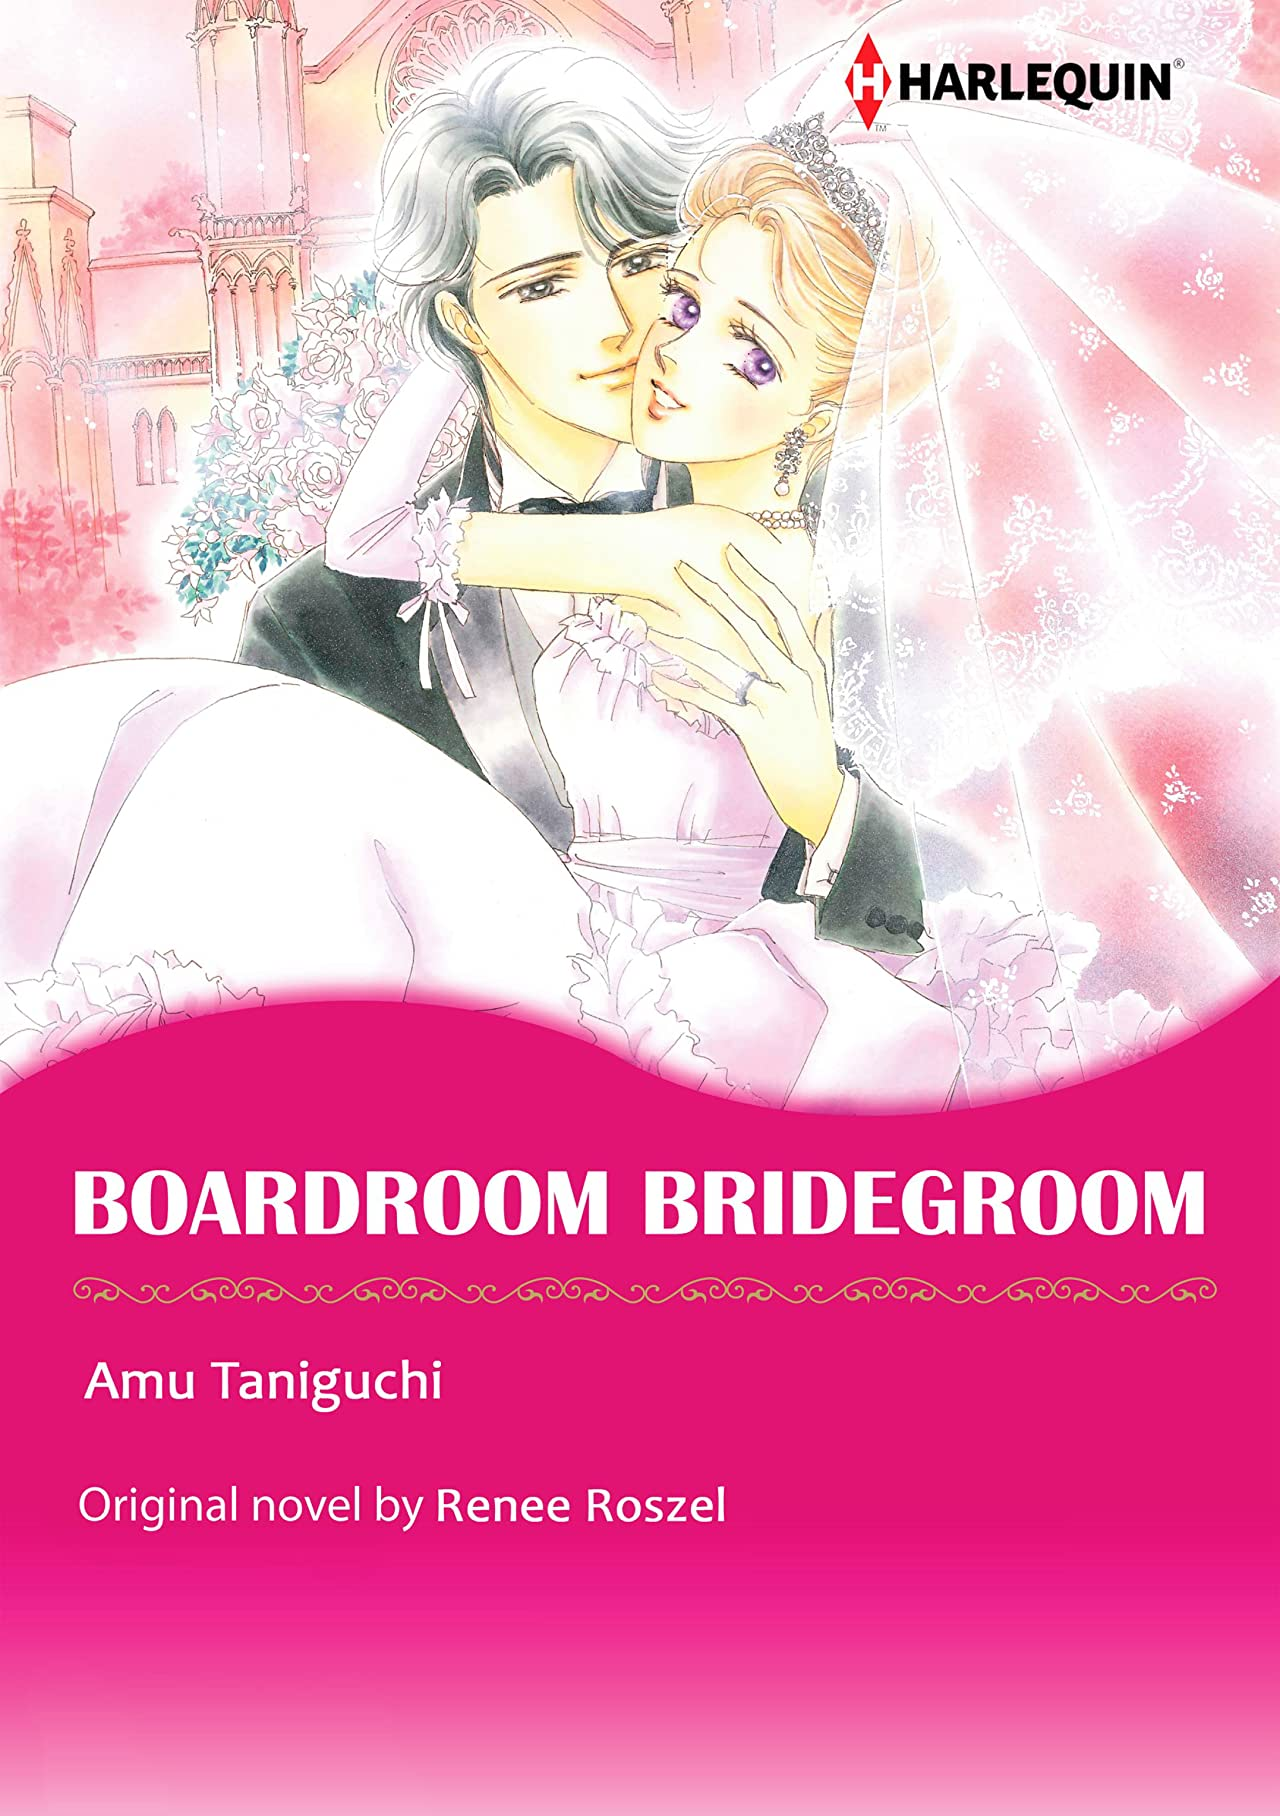 Boardroom Bridegroom